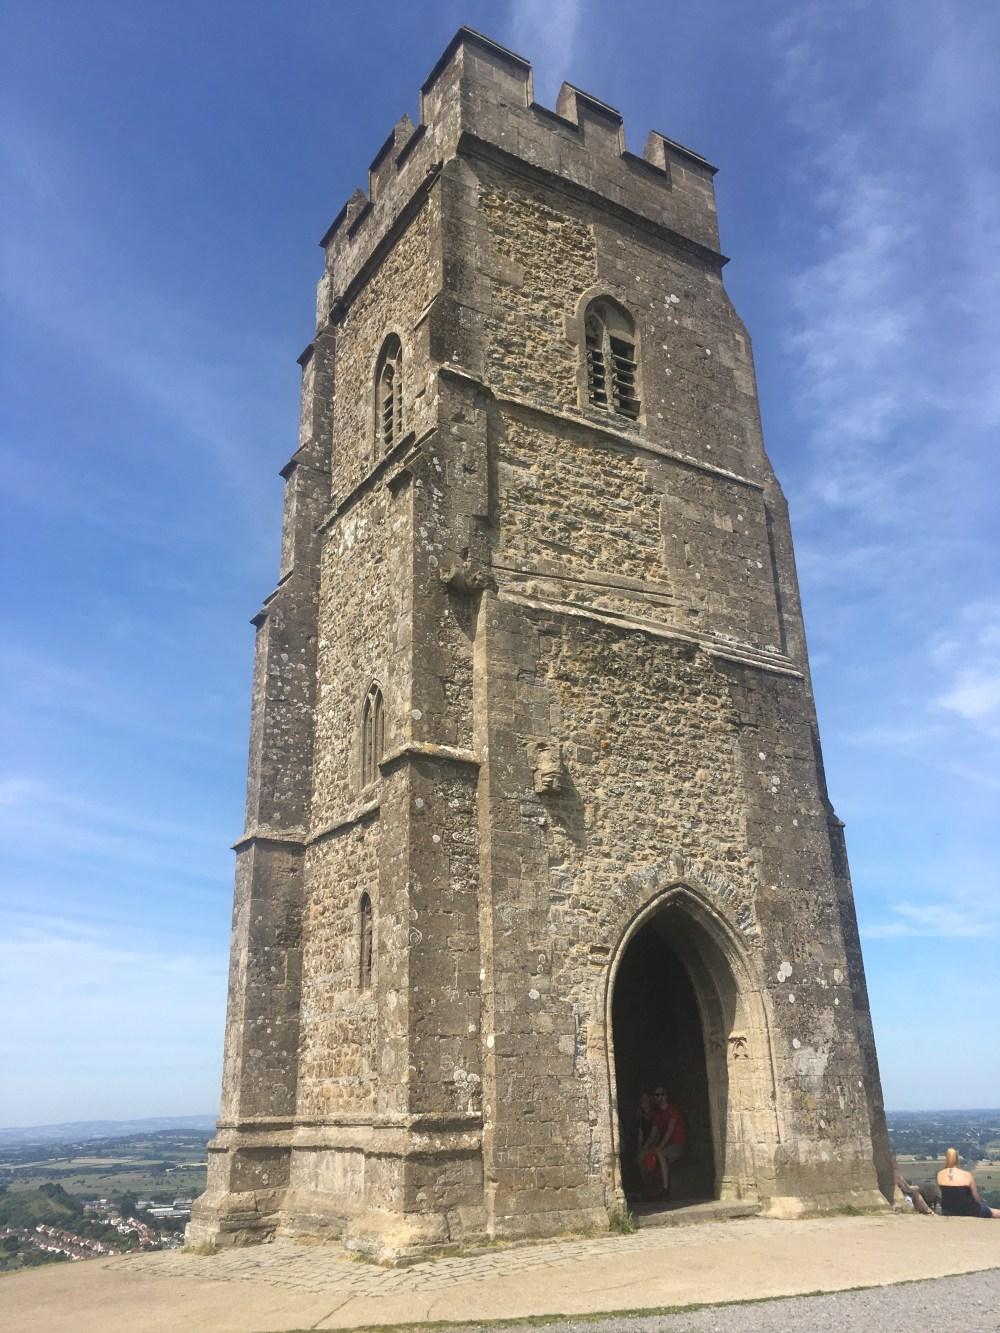 St Michael's Tower, Glastonbury Tor, LEJoG Day 21